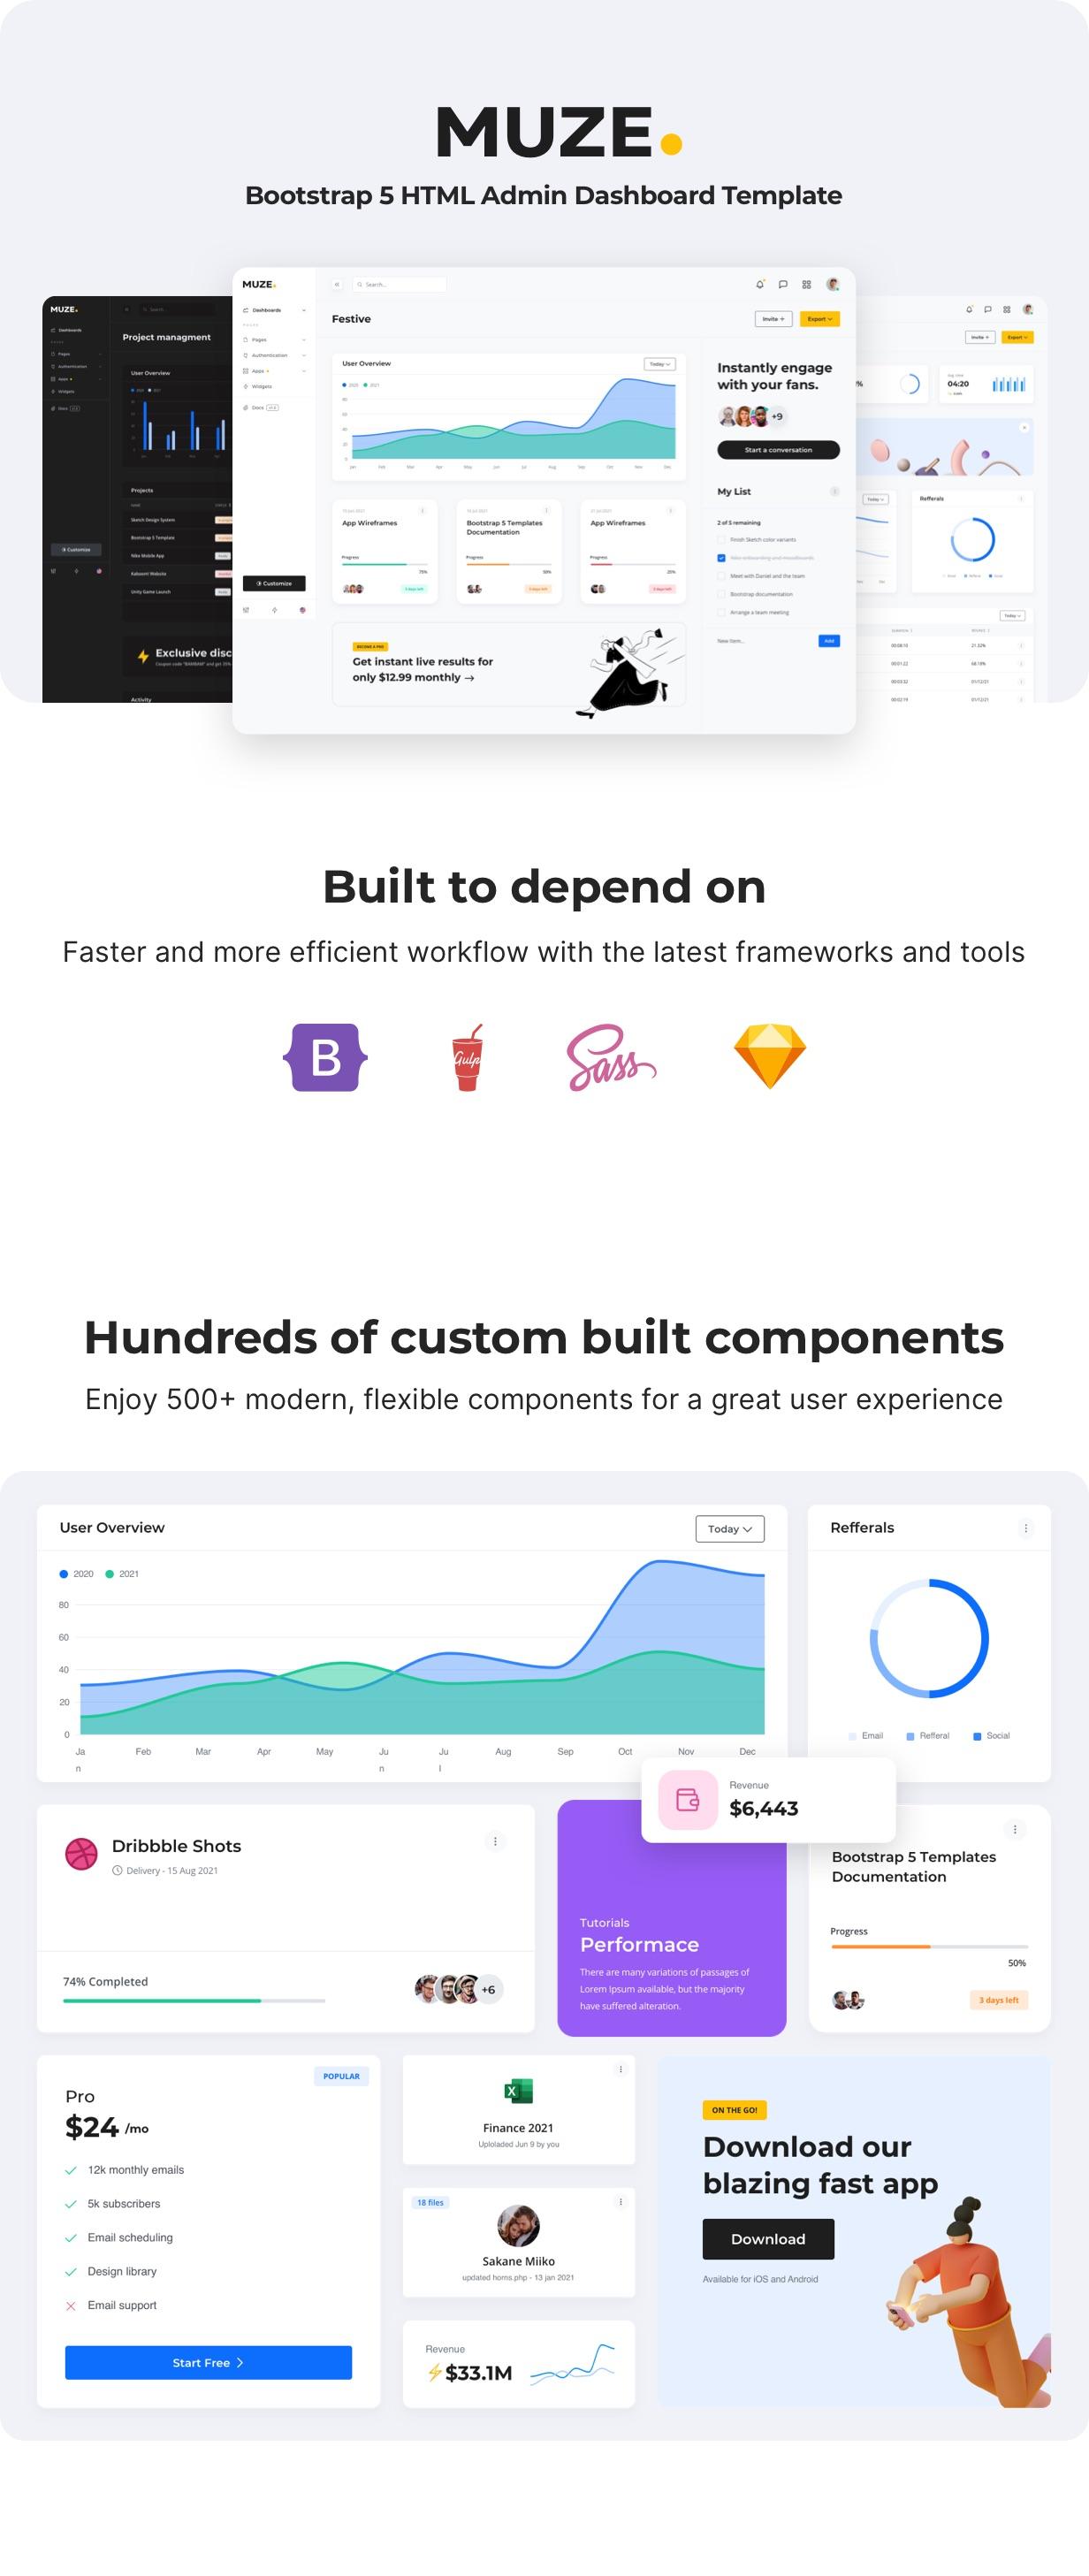 Muze - Bootstrap 5 HTML Admin Dashboard Template - 1